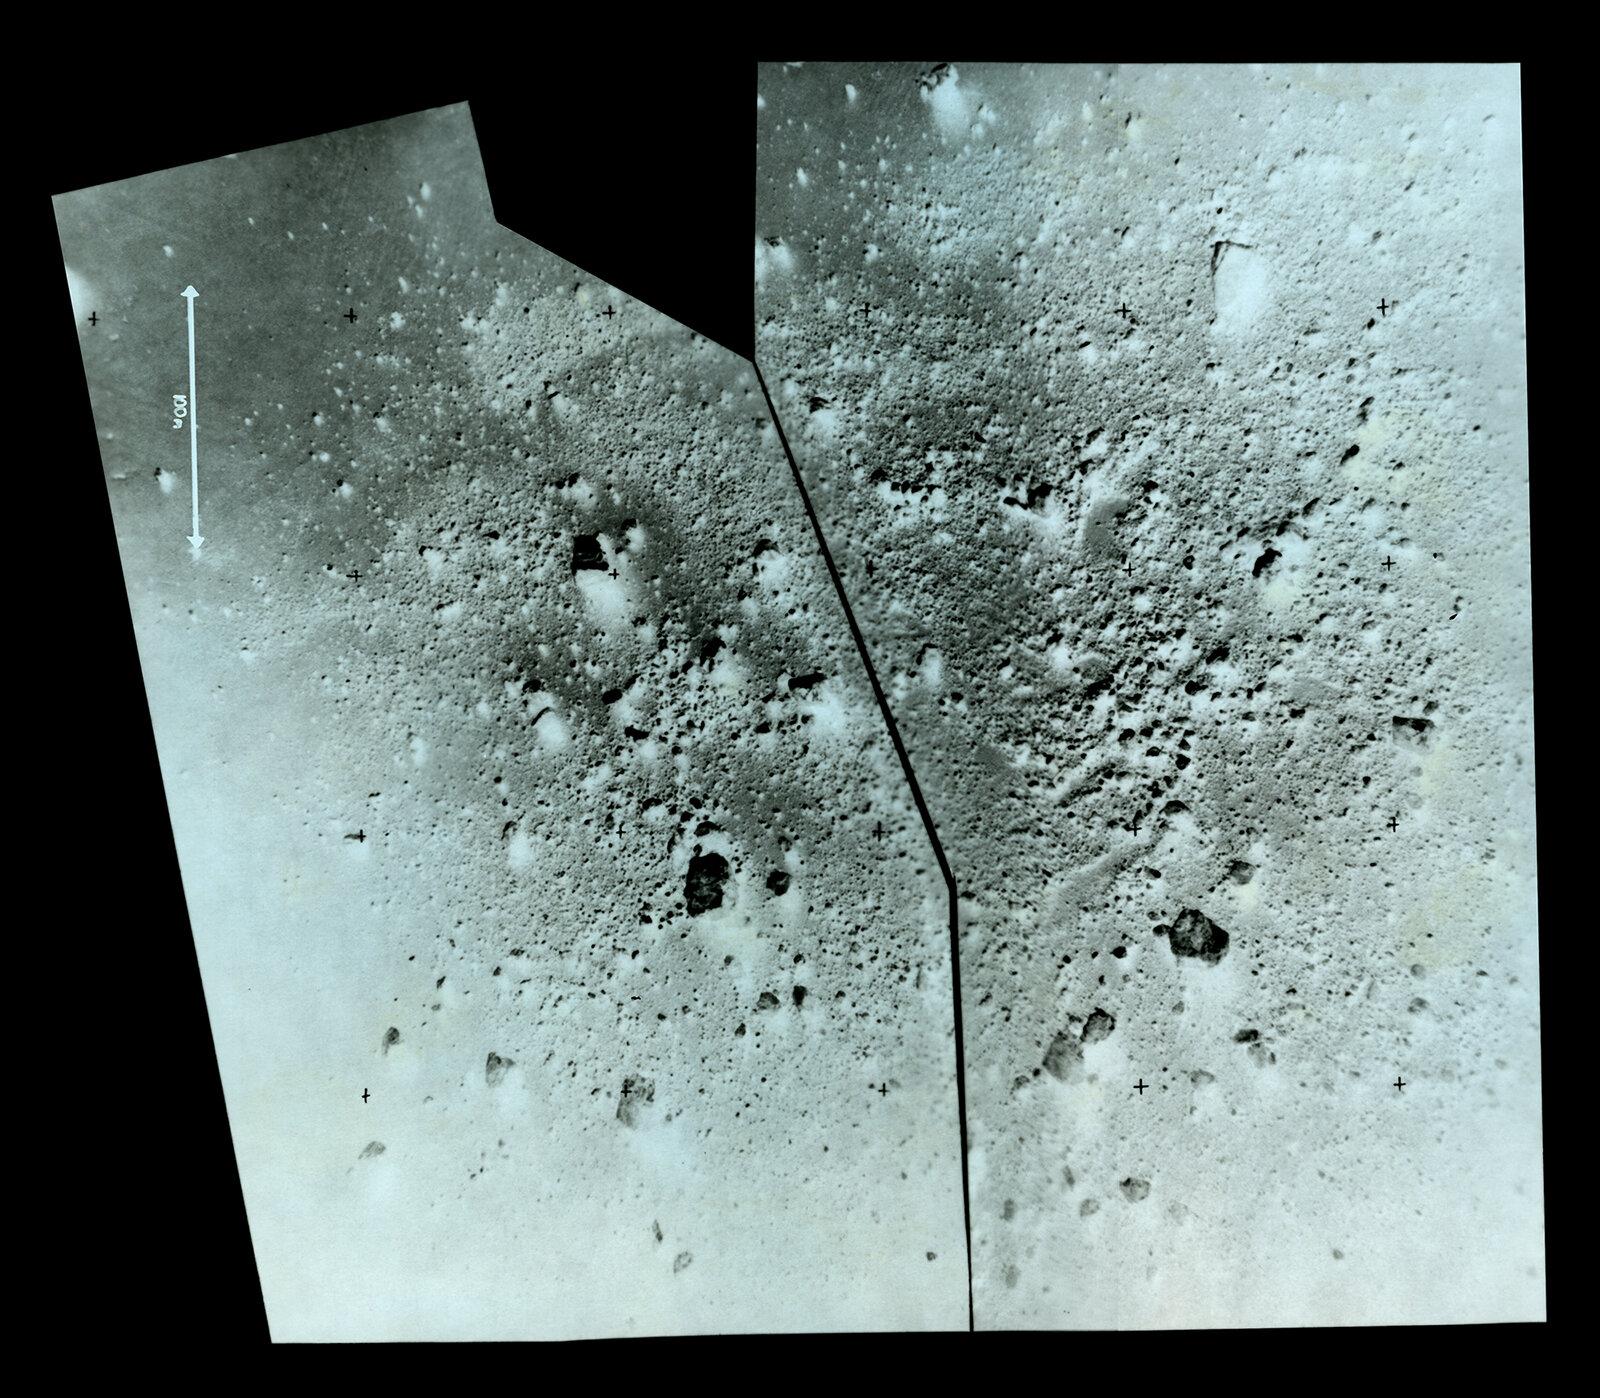 Lunar Sample Collection Site